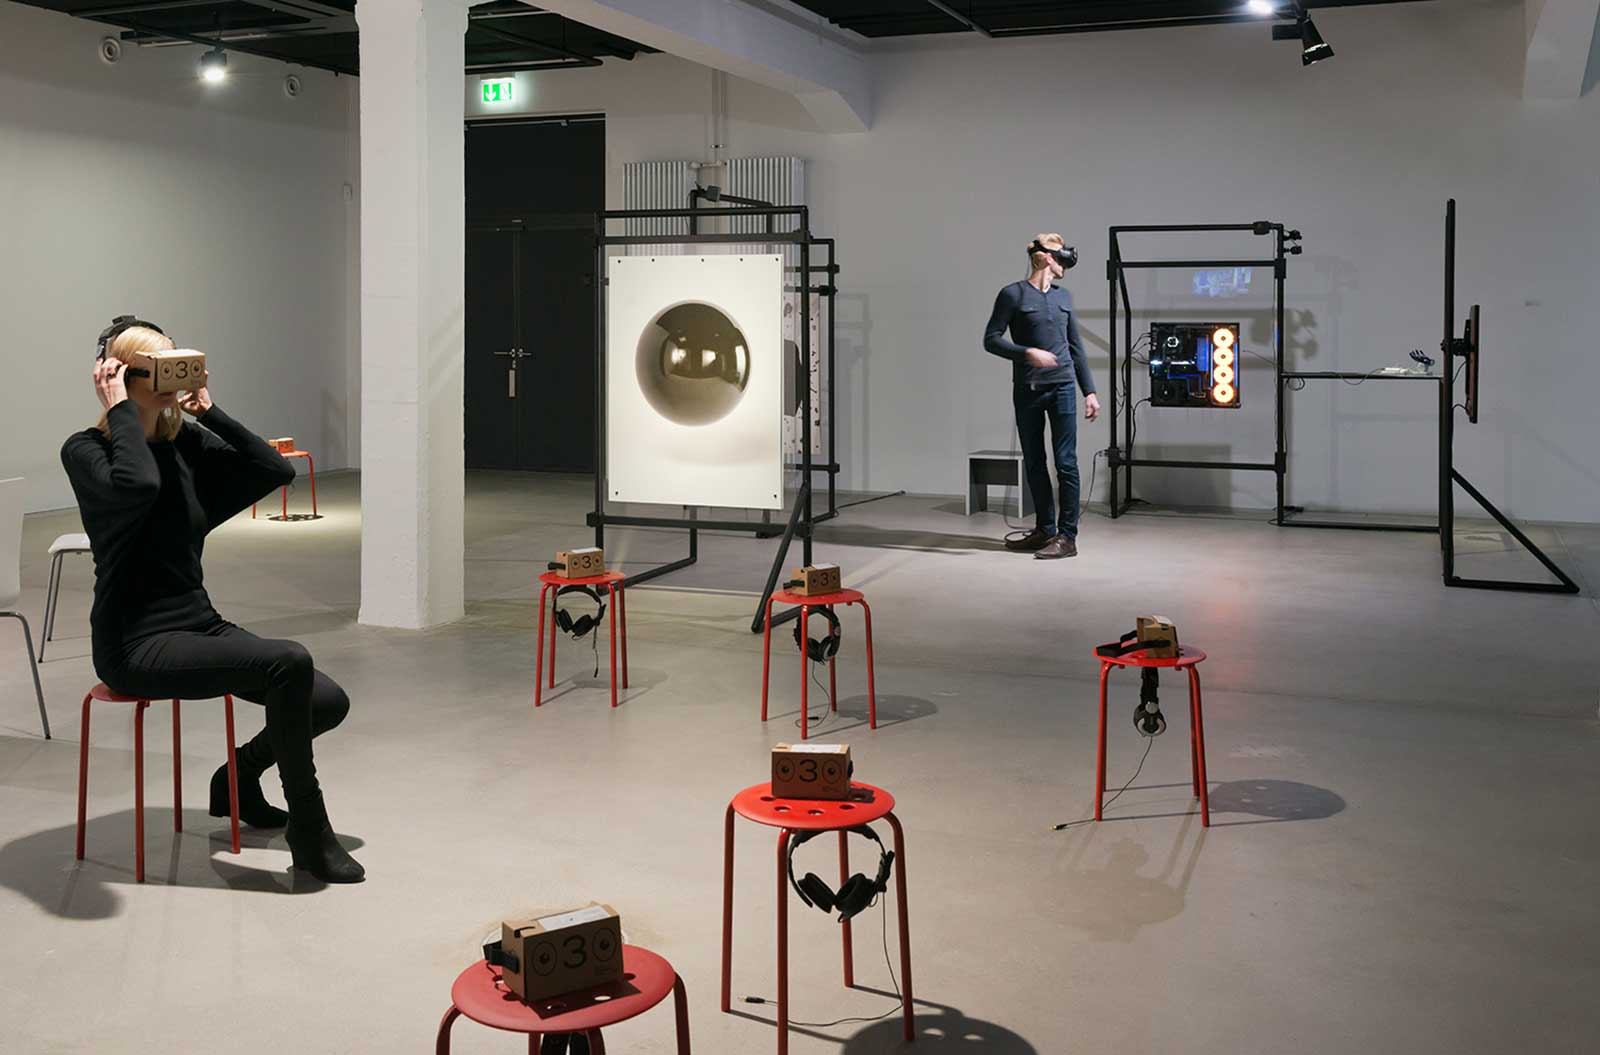 THE UNFRAMED WORLD, HeK Basel, Exhibitionview, Photo by Franz Wamhof